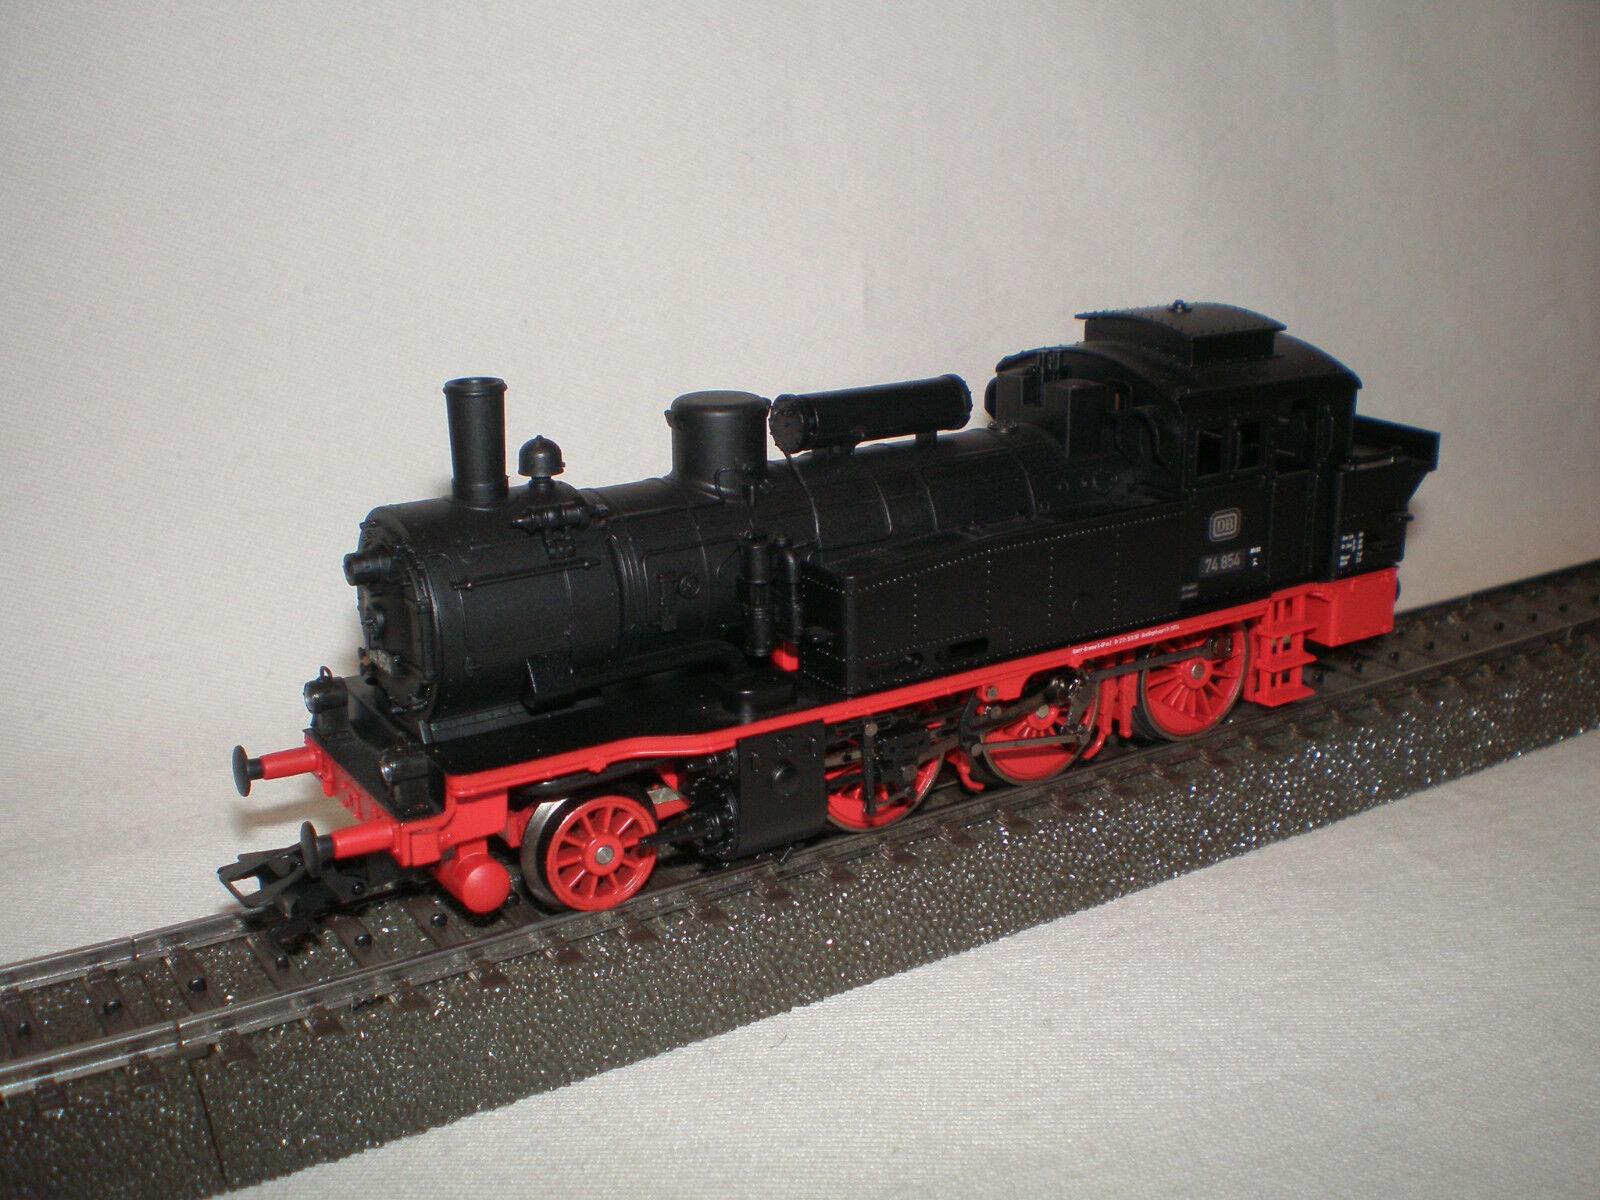 Märklin H0 Dampflok Lok Lok Lok BR 74 DB KK digital mfx aus 29013 ähnl. 36740 Neu  | Einfach zu spielen, freies Leben  0c2605